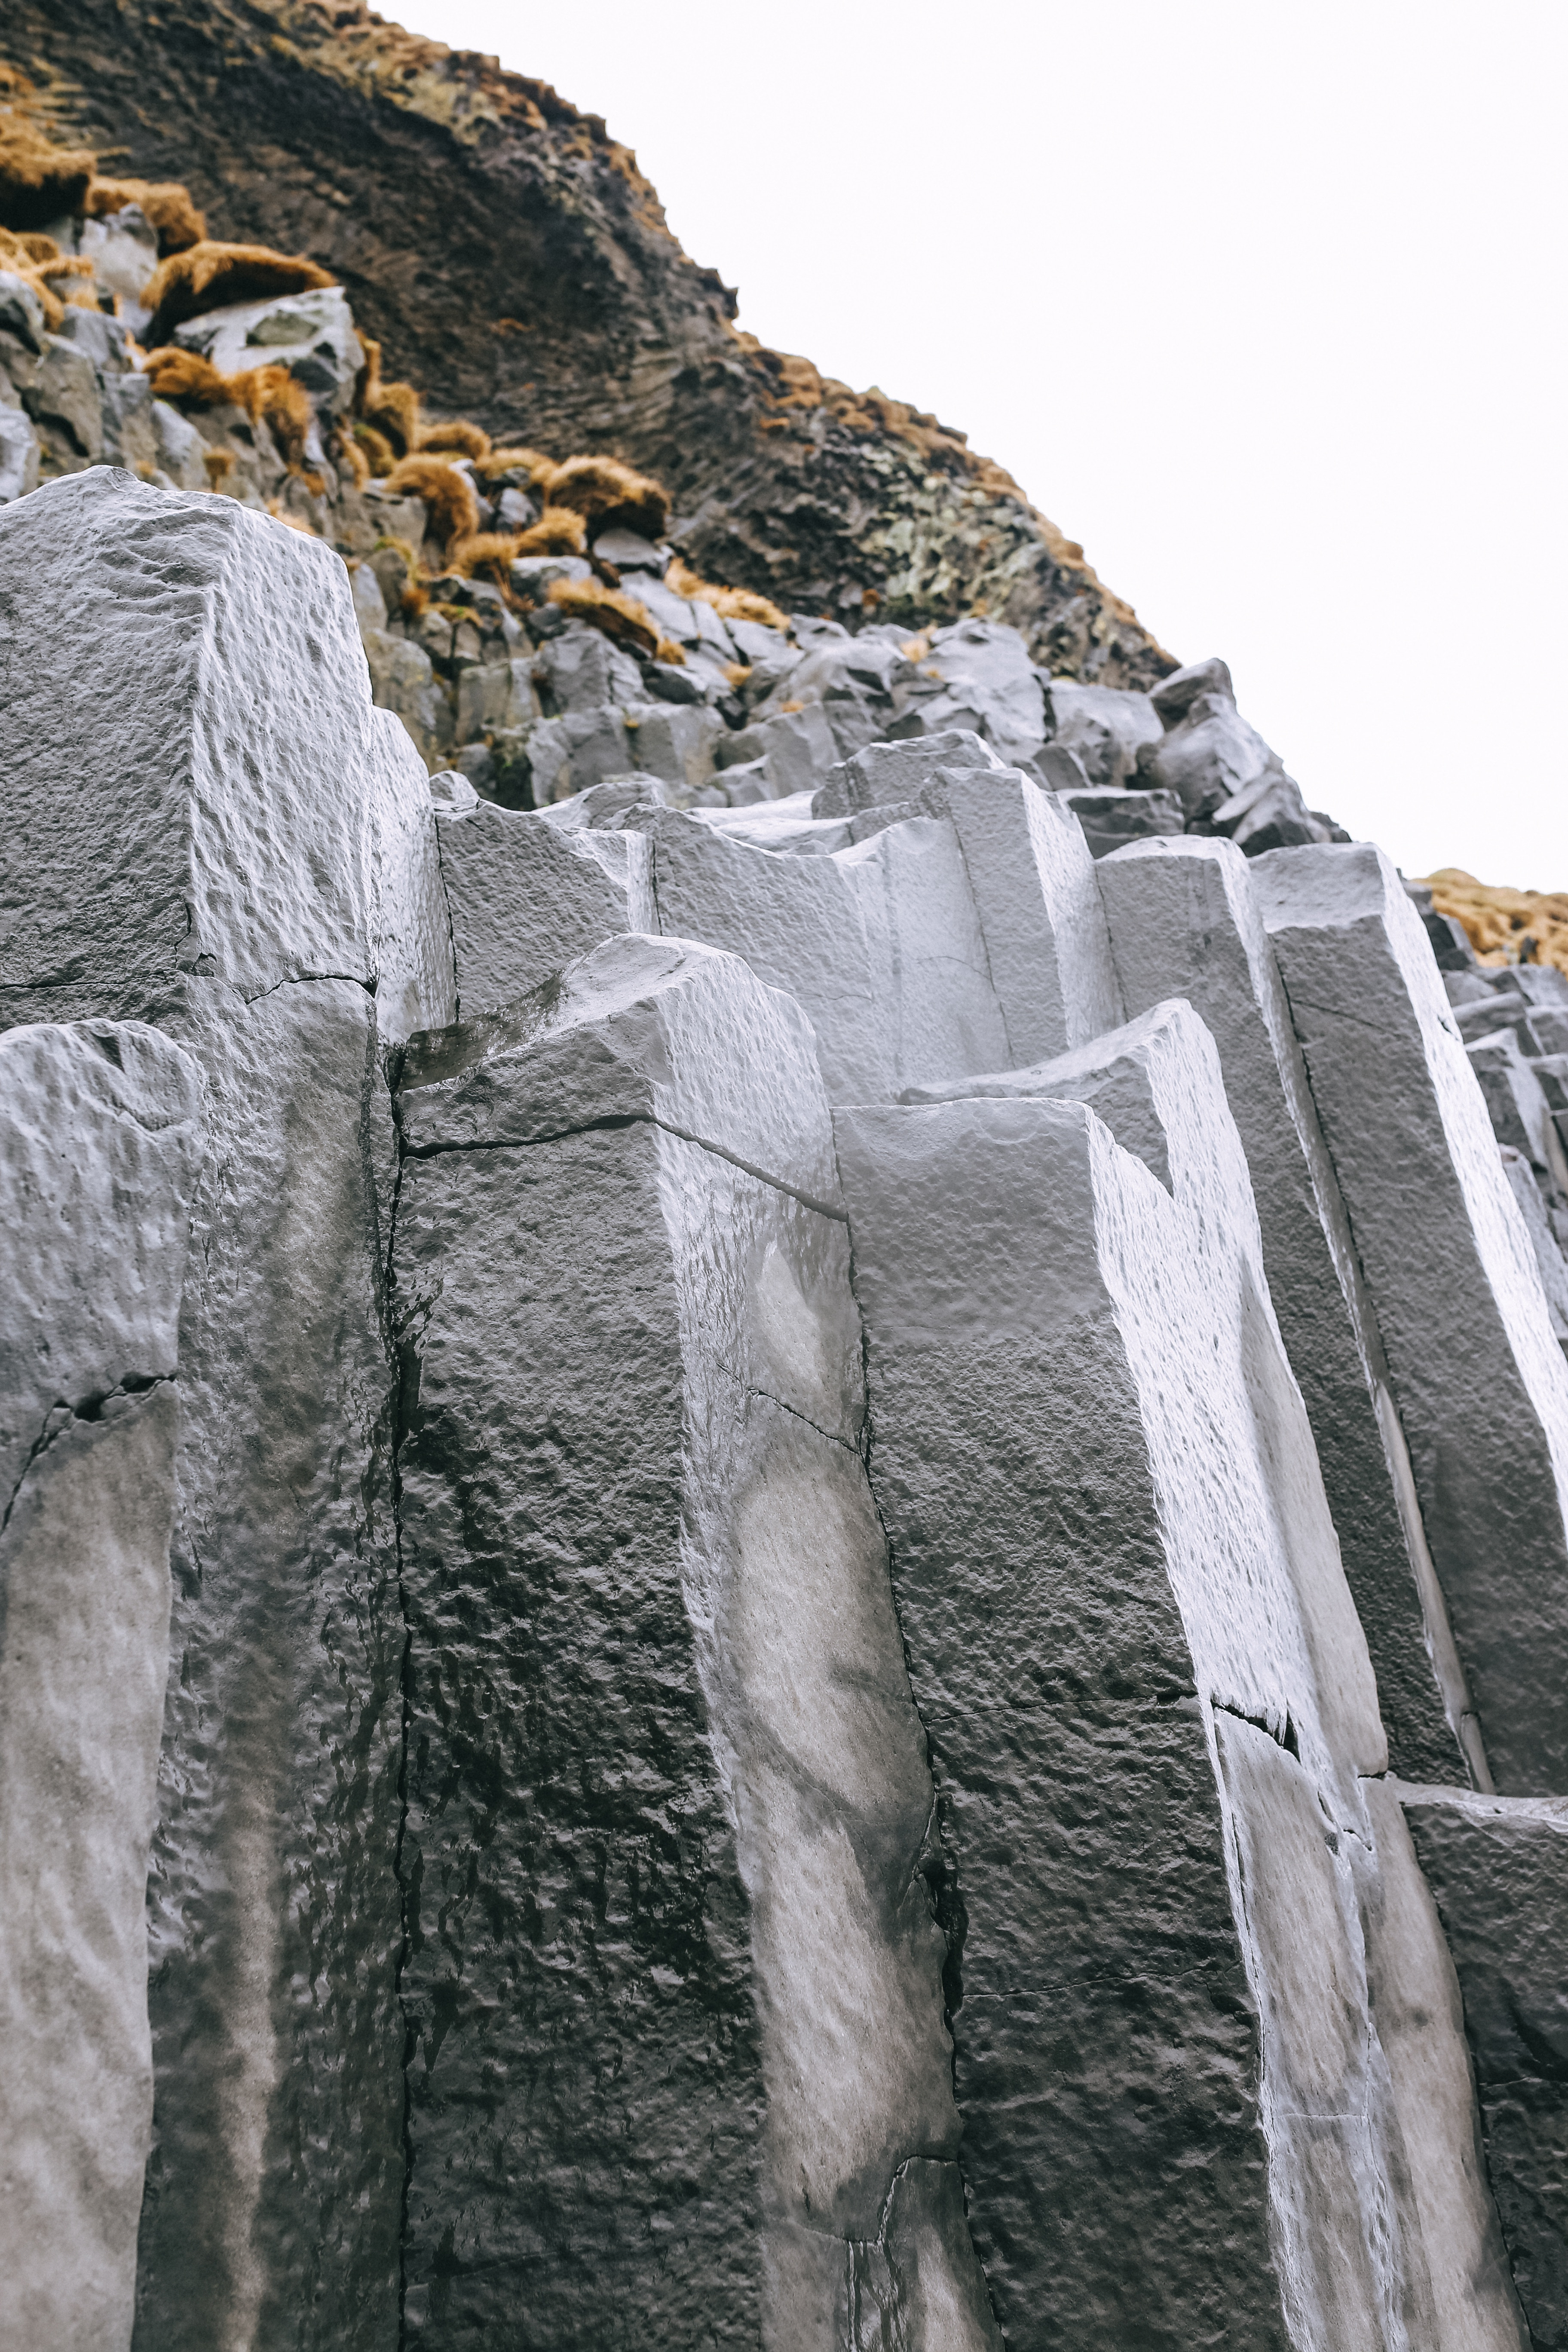 Basalt columns at Reynisfjara Beach in Vik, Iceland.